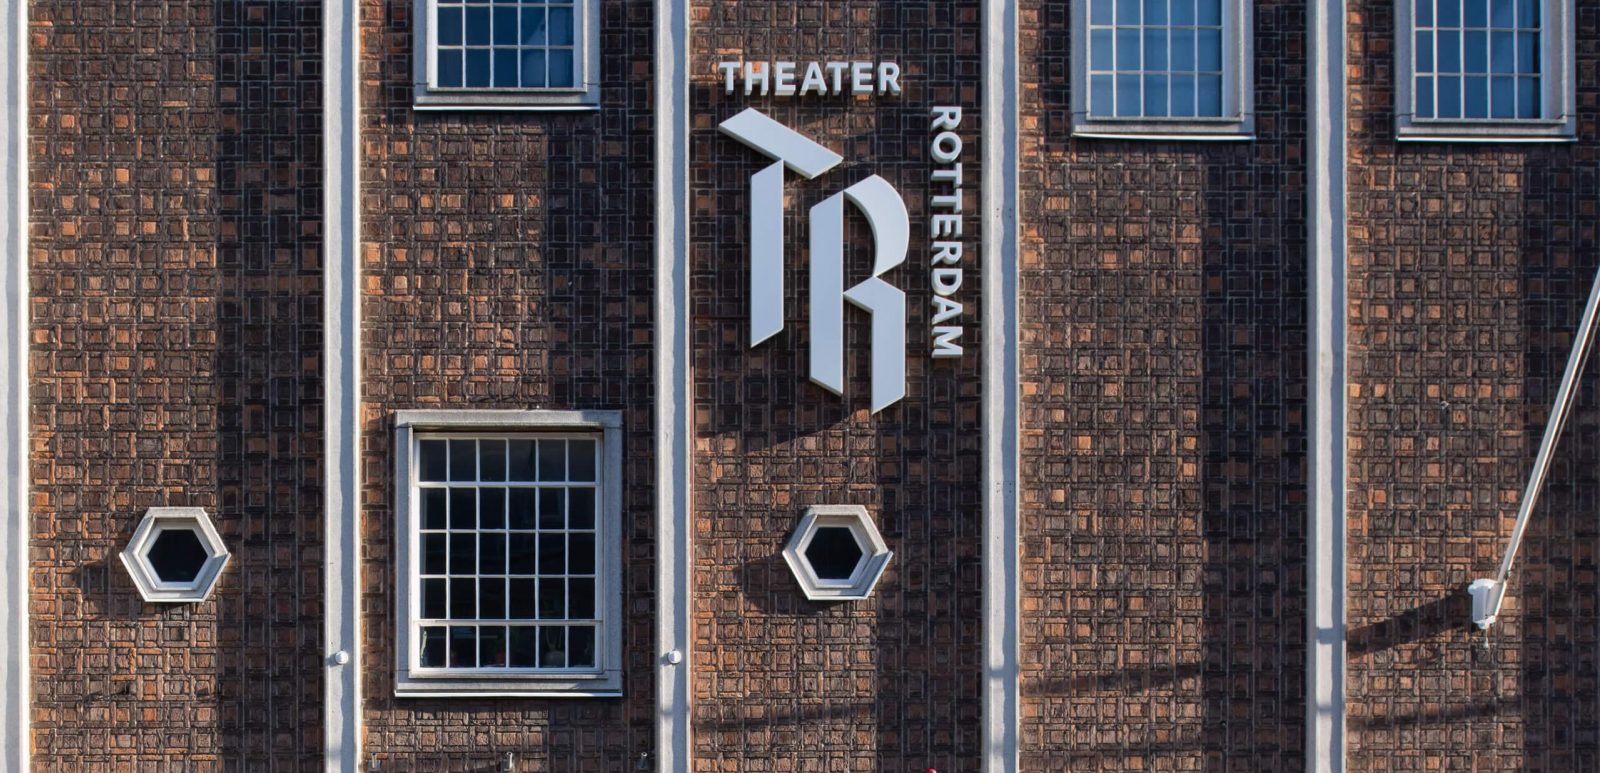 Ro-Theater2